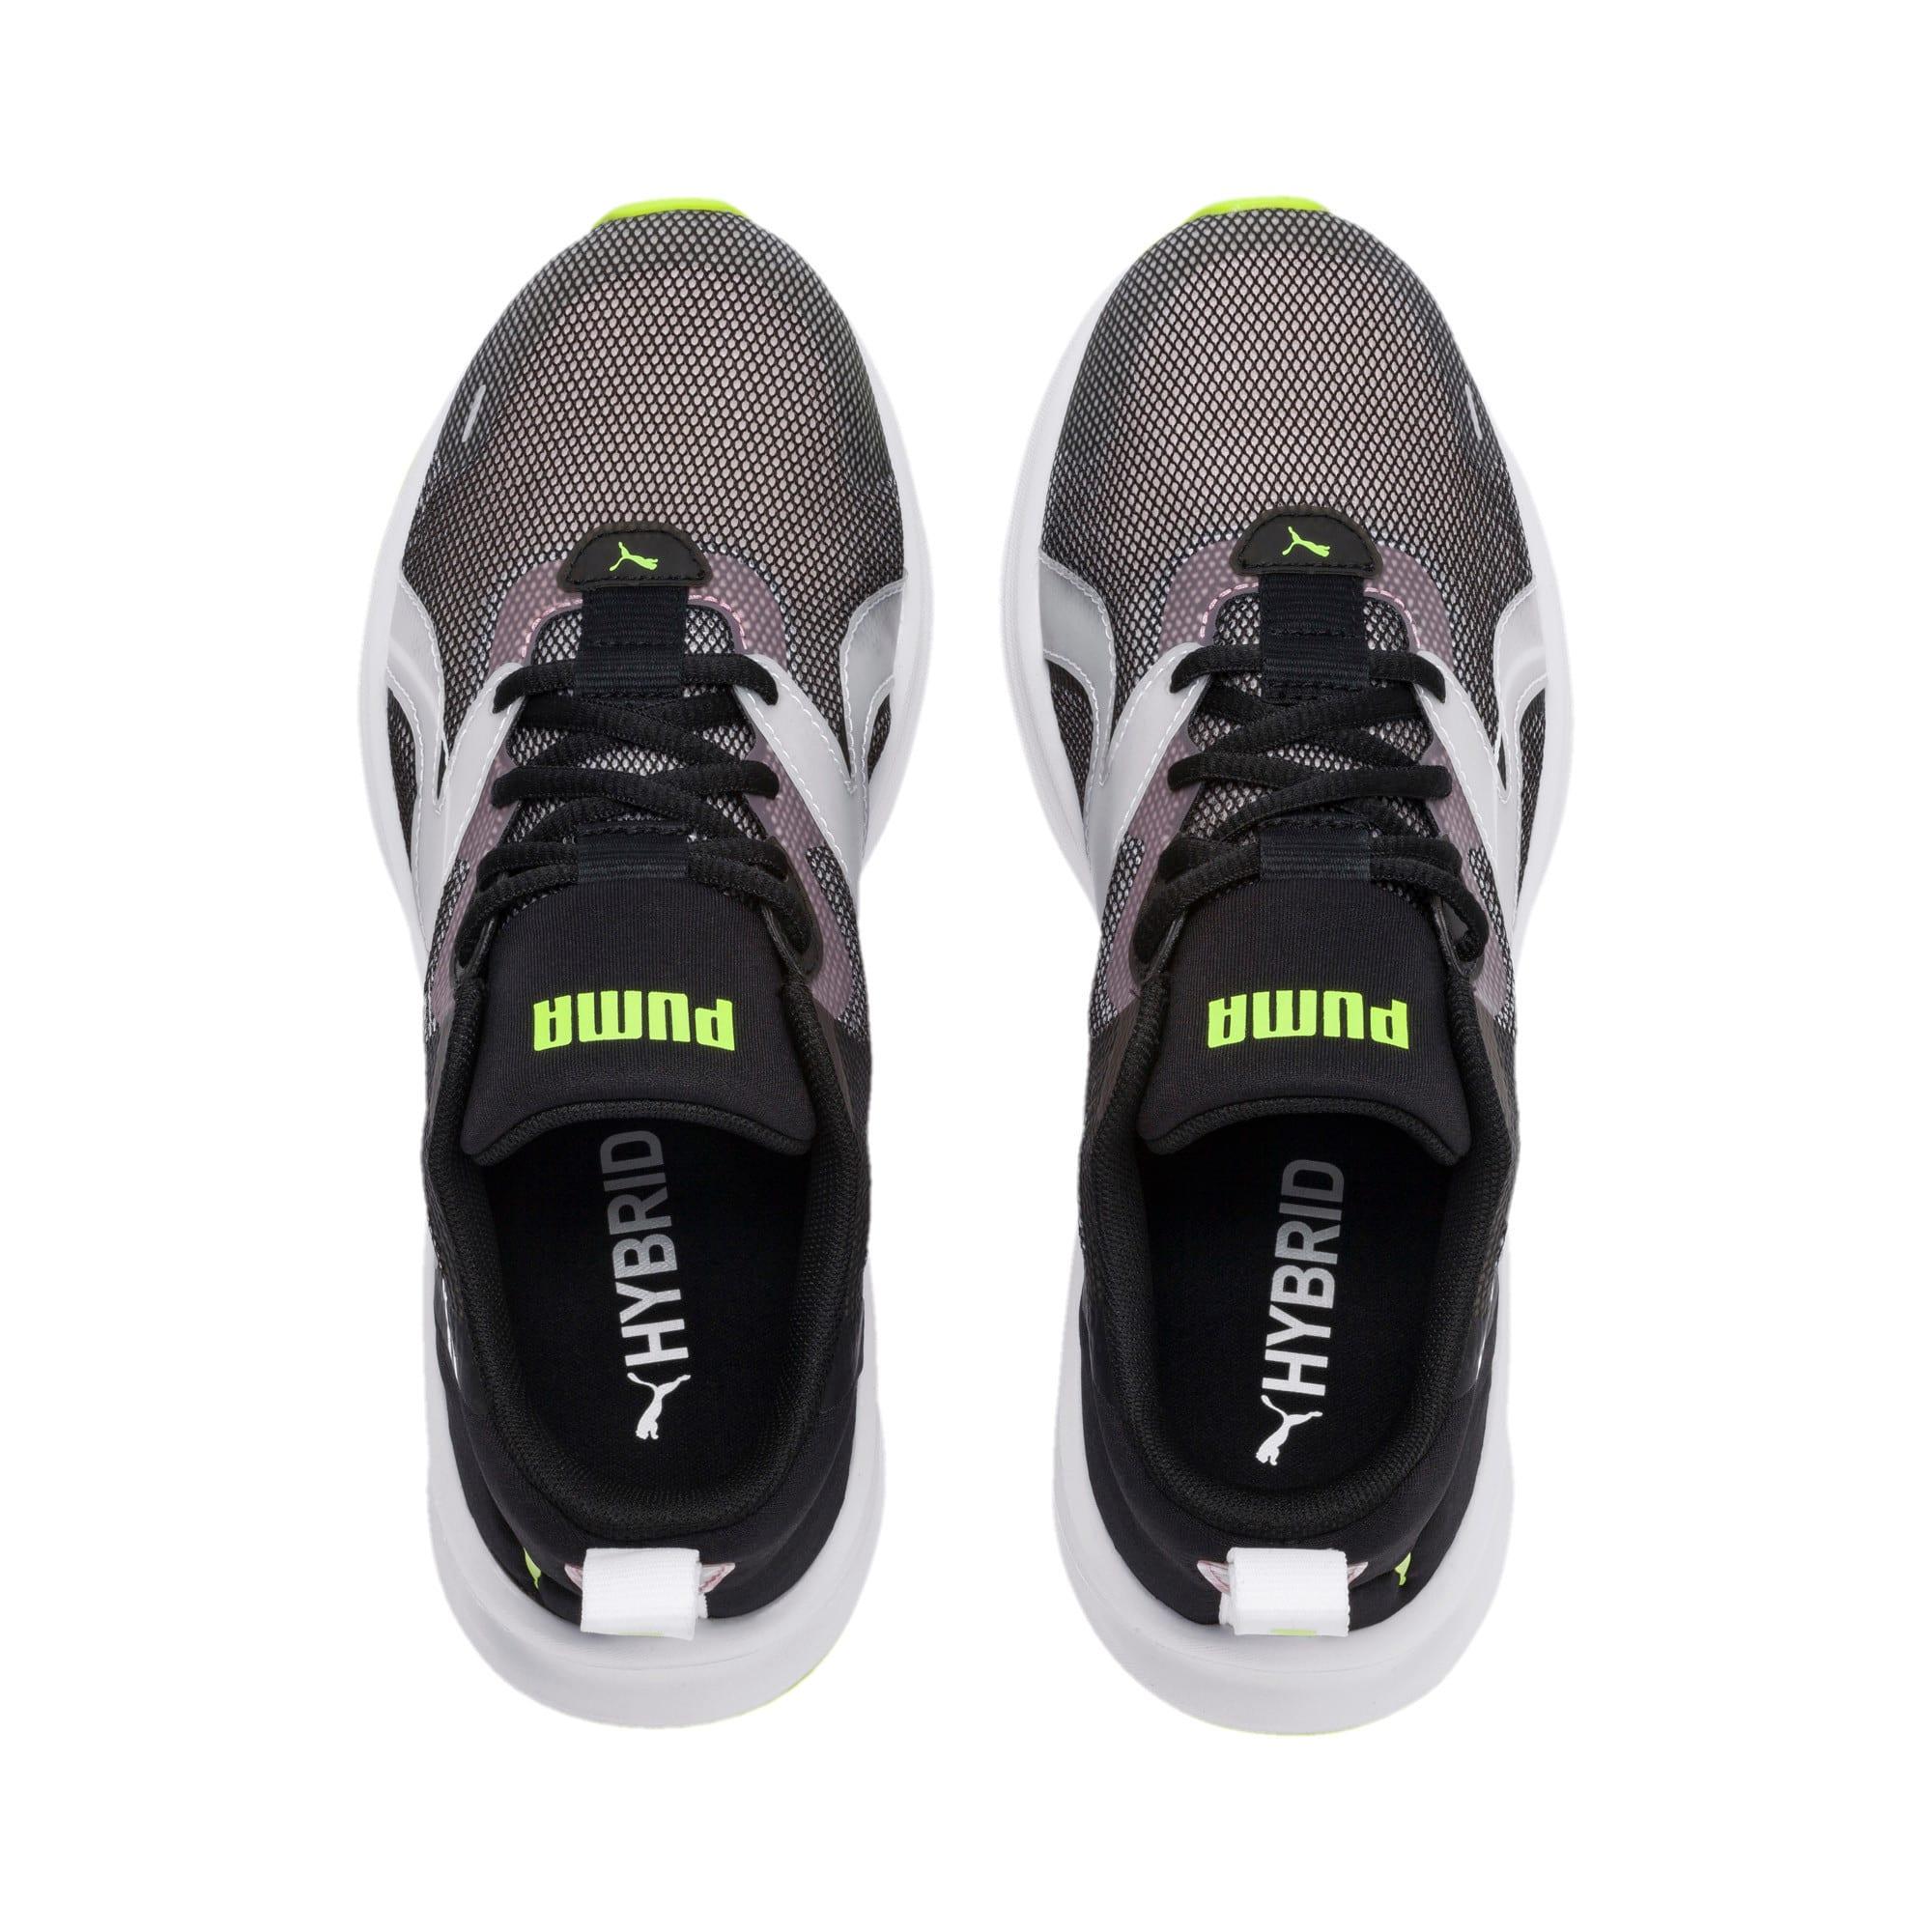 Thumbnail 4 of HYBRID Fuego Shift Women's Running Shoes, Puma Black-Bridal Rose, medium-IND